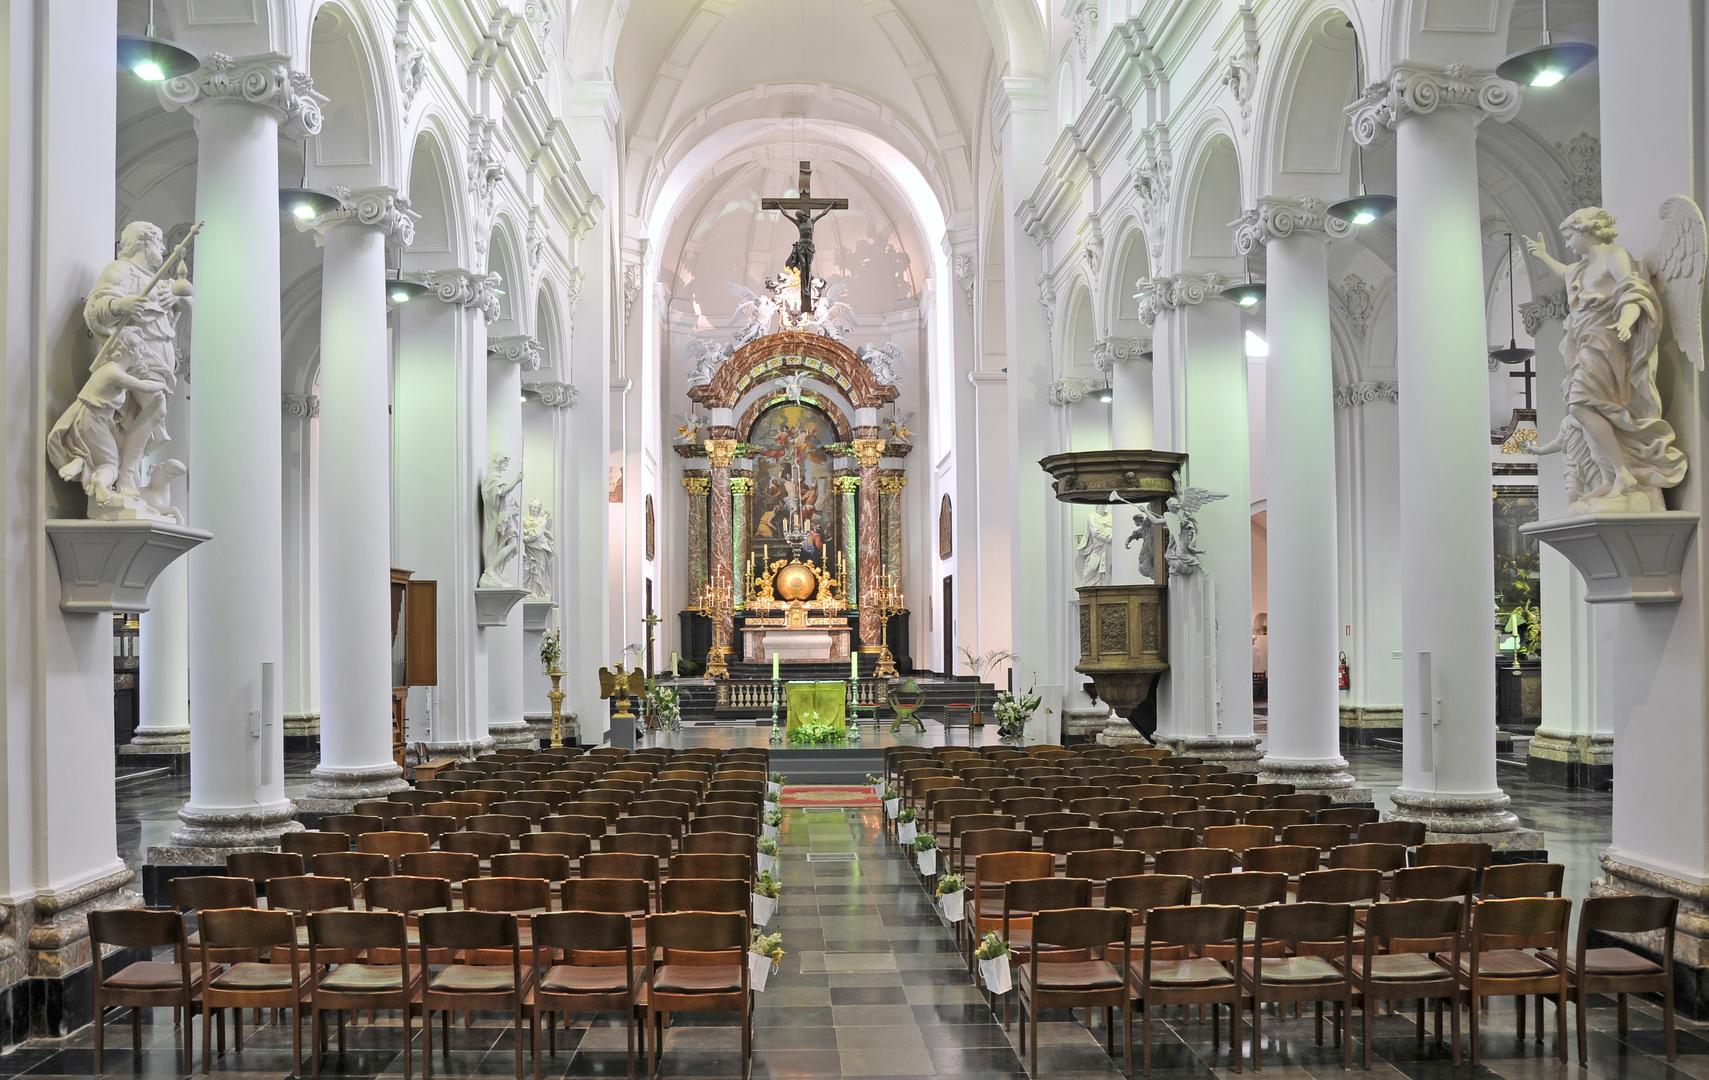 St.Bathelemy (Lüttich)